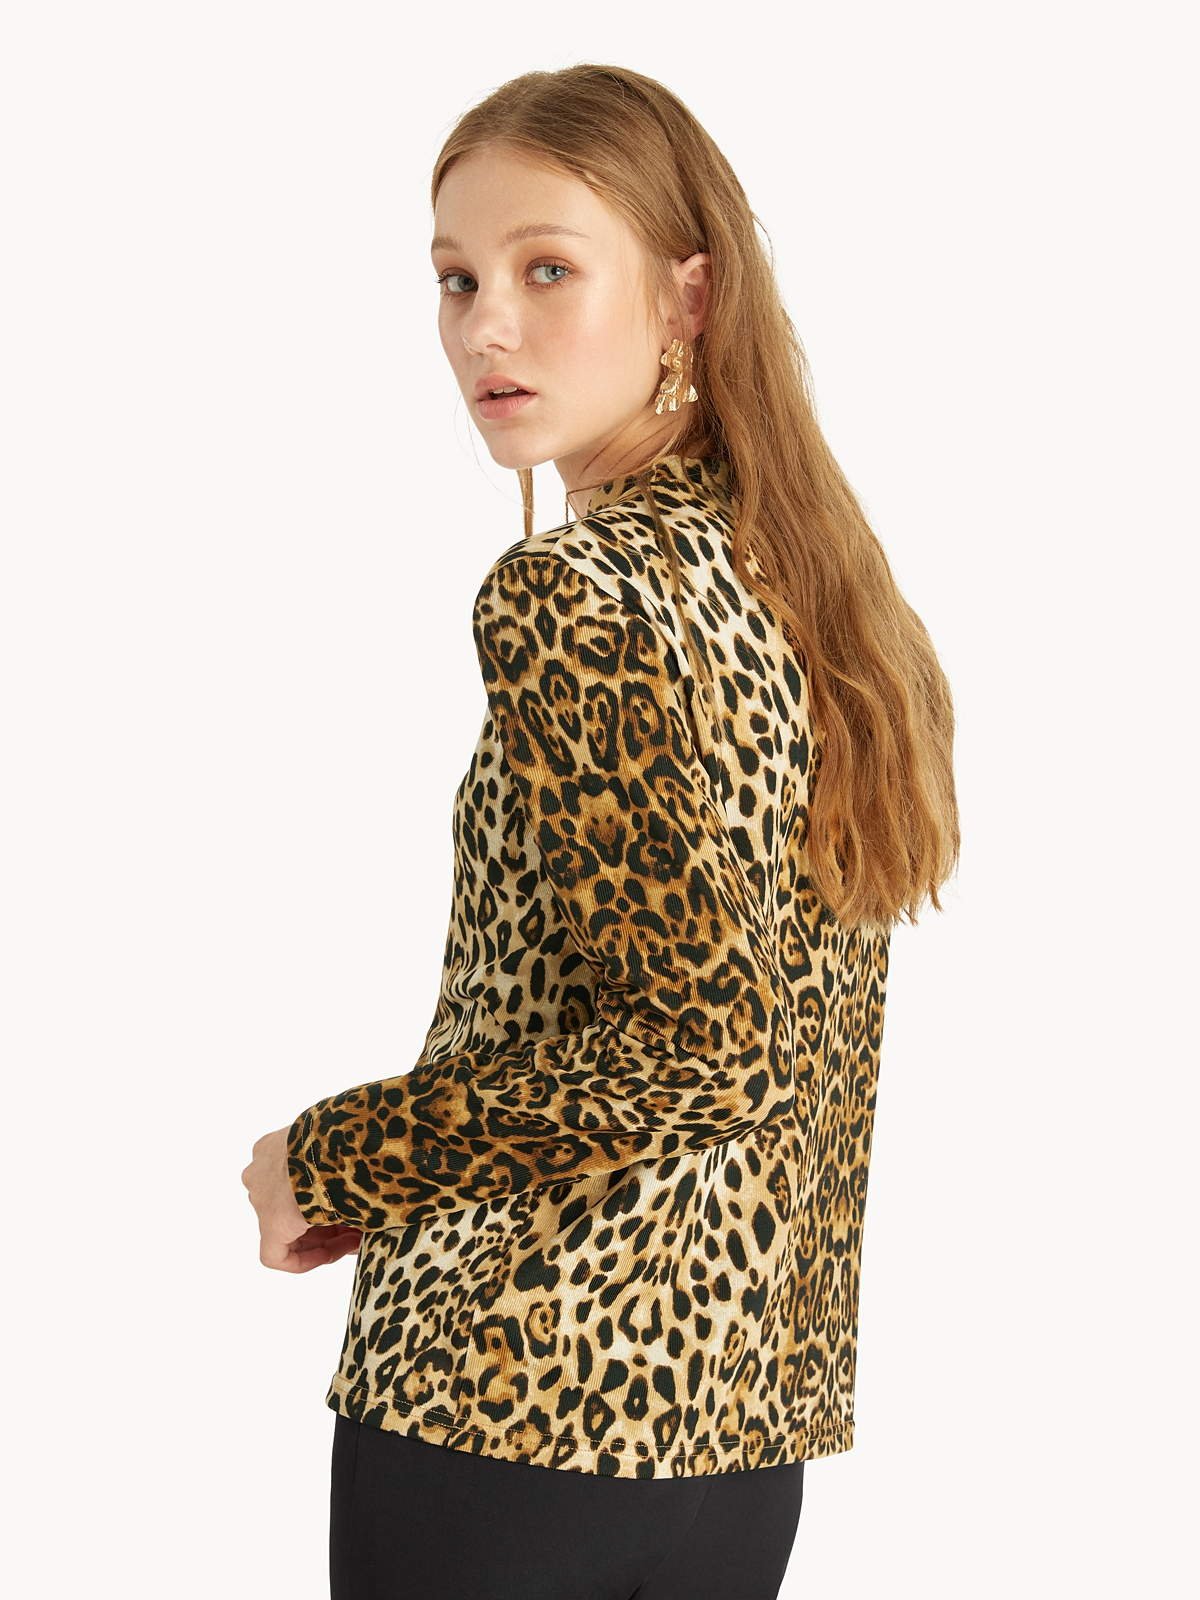 Jaguar Mock Neck Top Brown